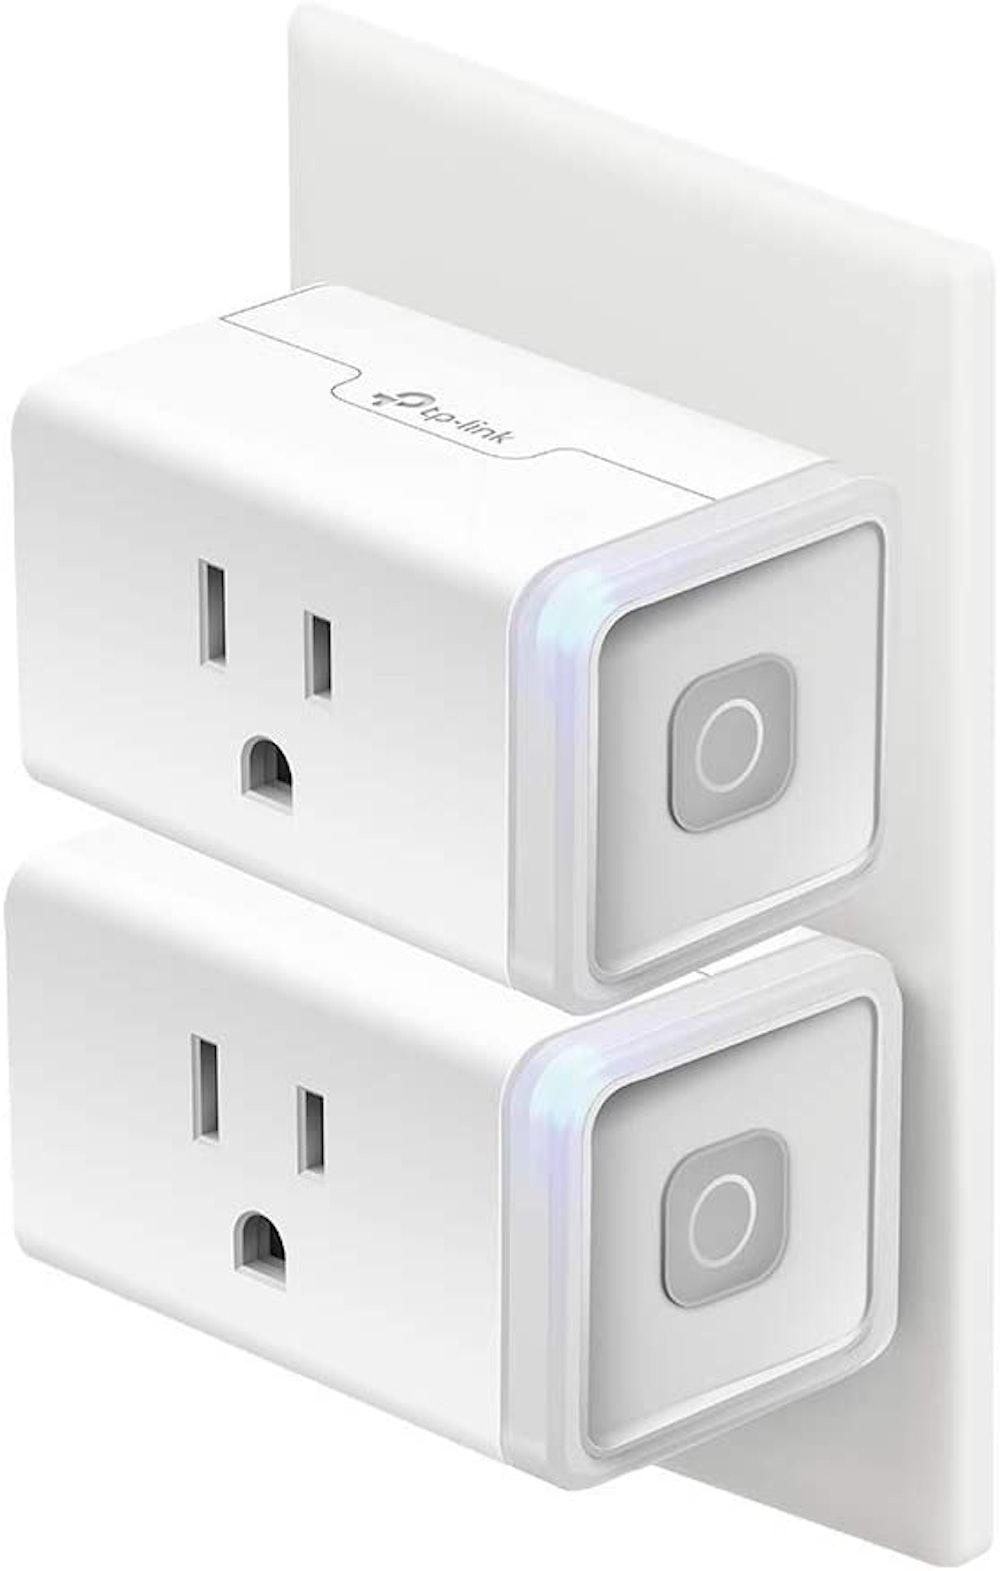 2-Pack Kasa Smart Plugs (Works with Alexa, Echo, Google Home & IFTTT)